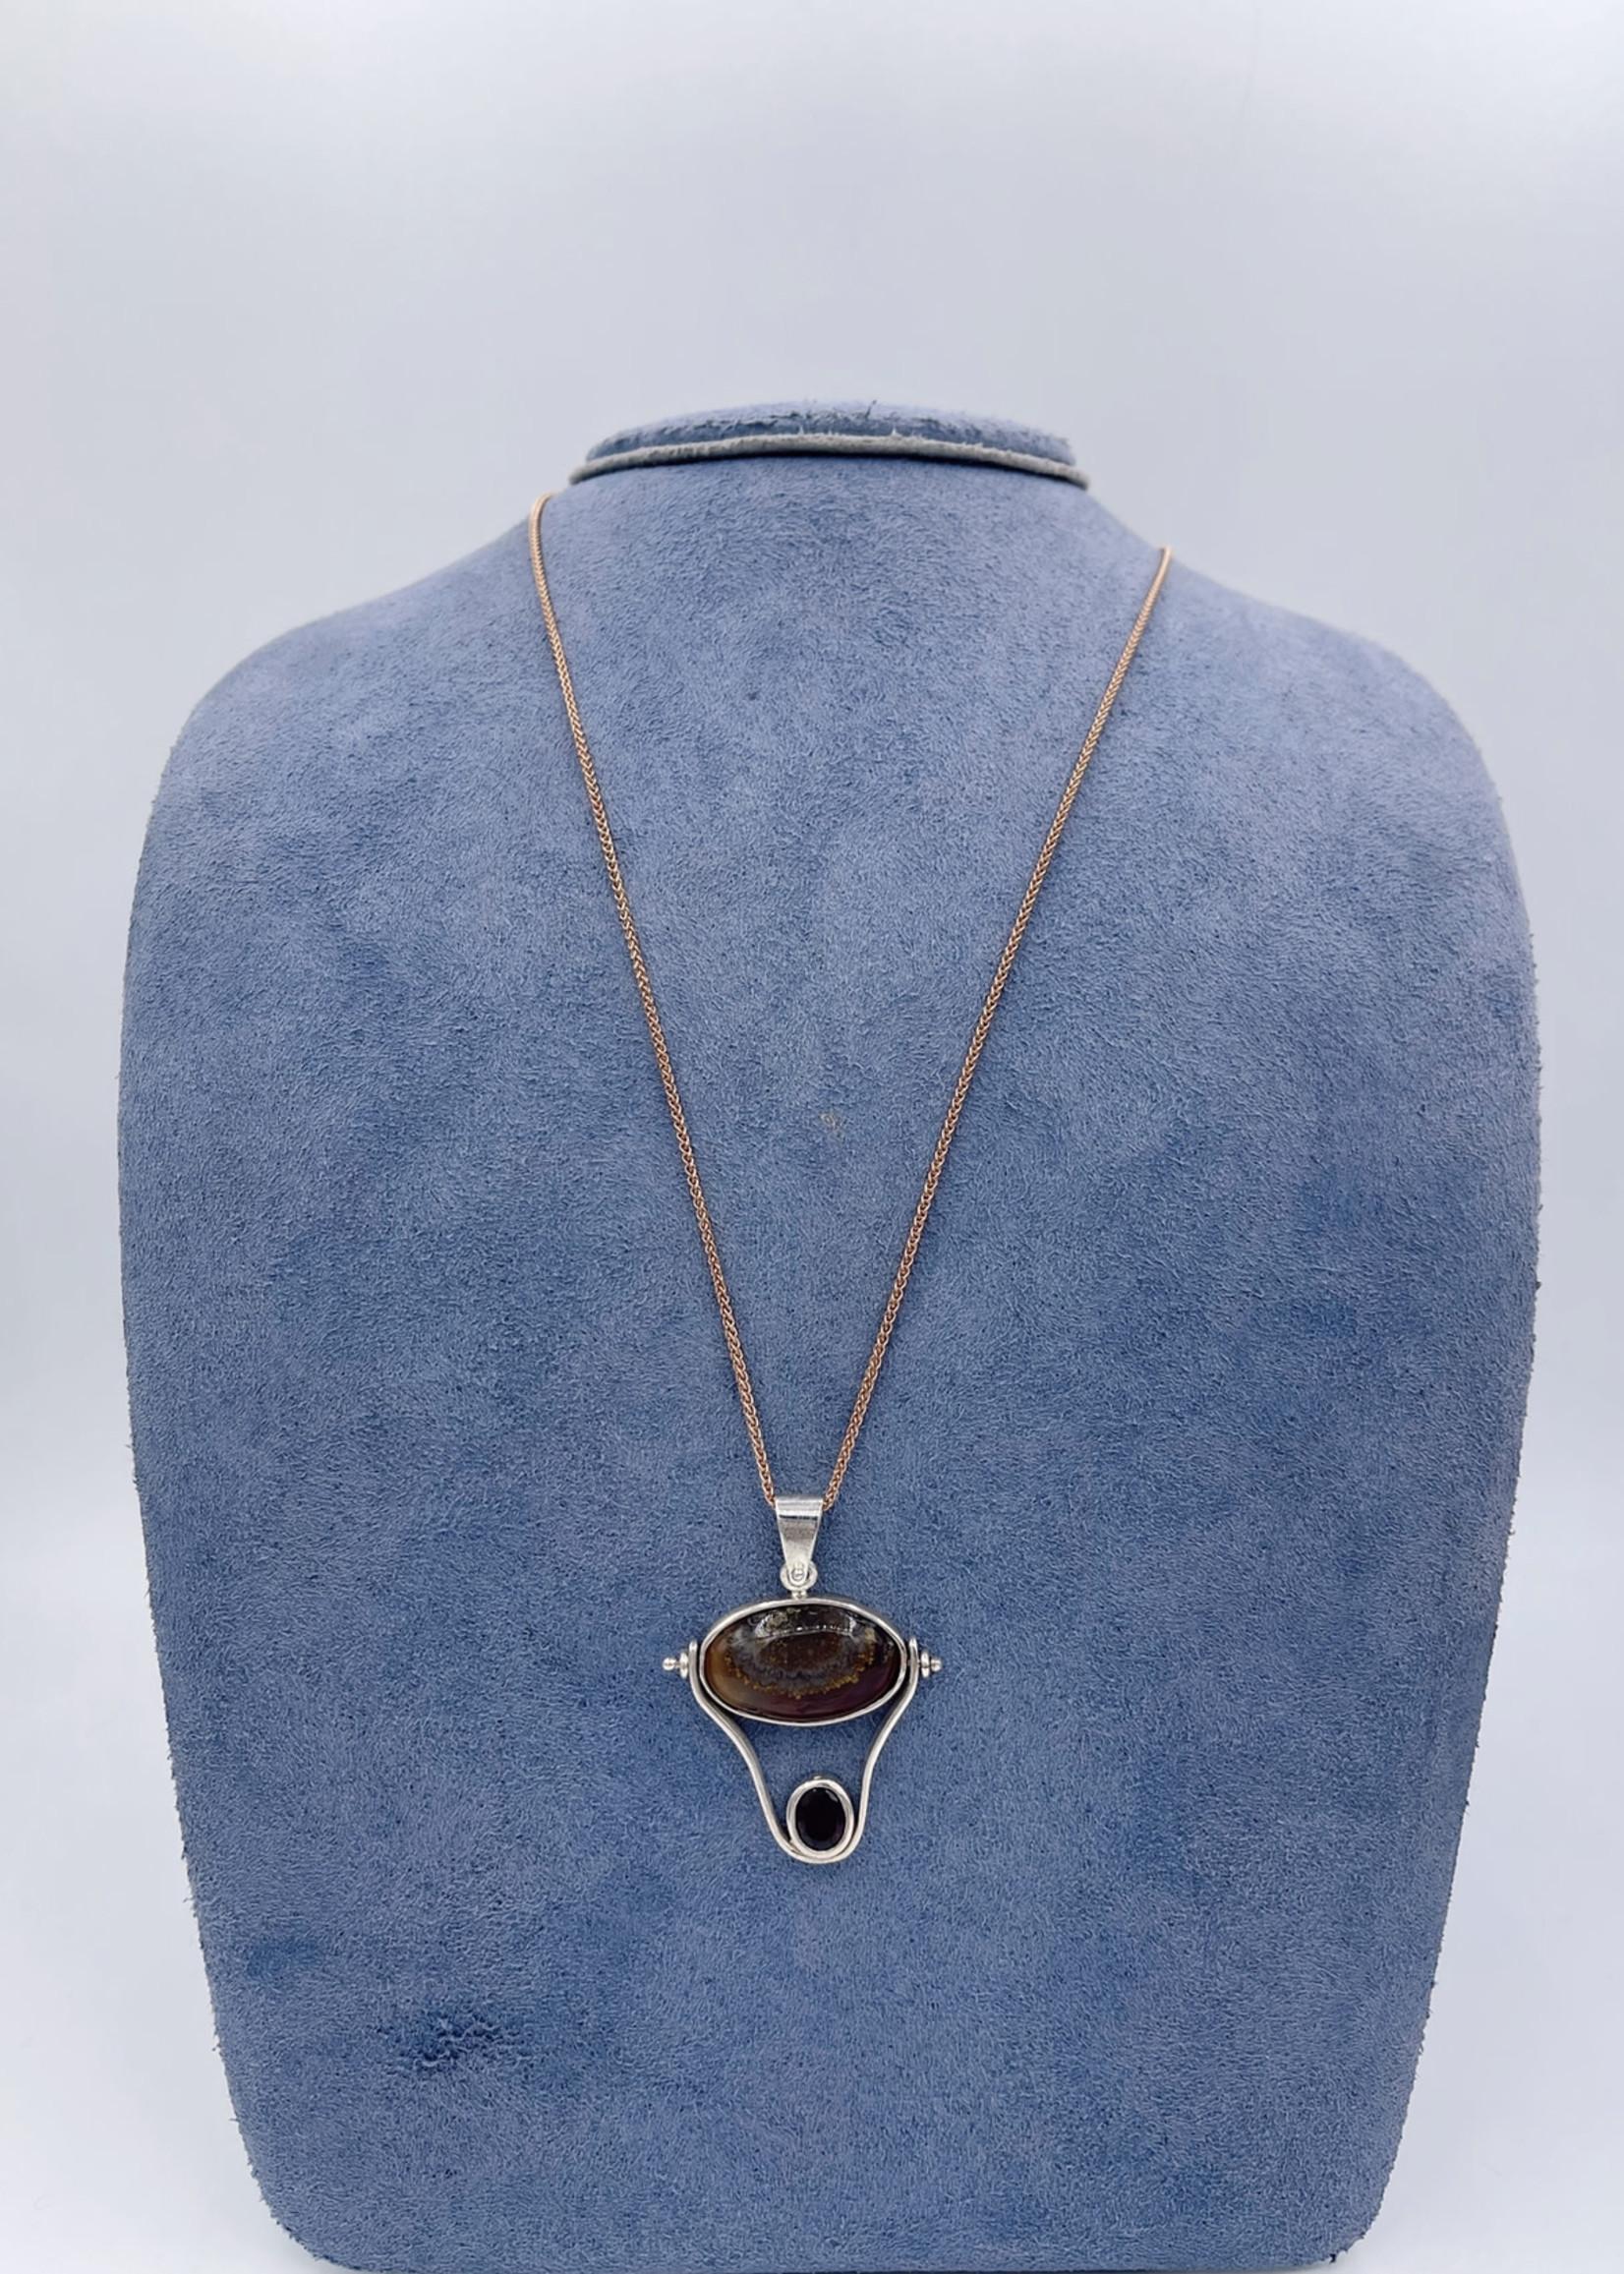 CJ Designs Rhodalite Garnet, Agate Pendant Silver